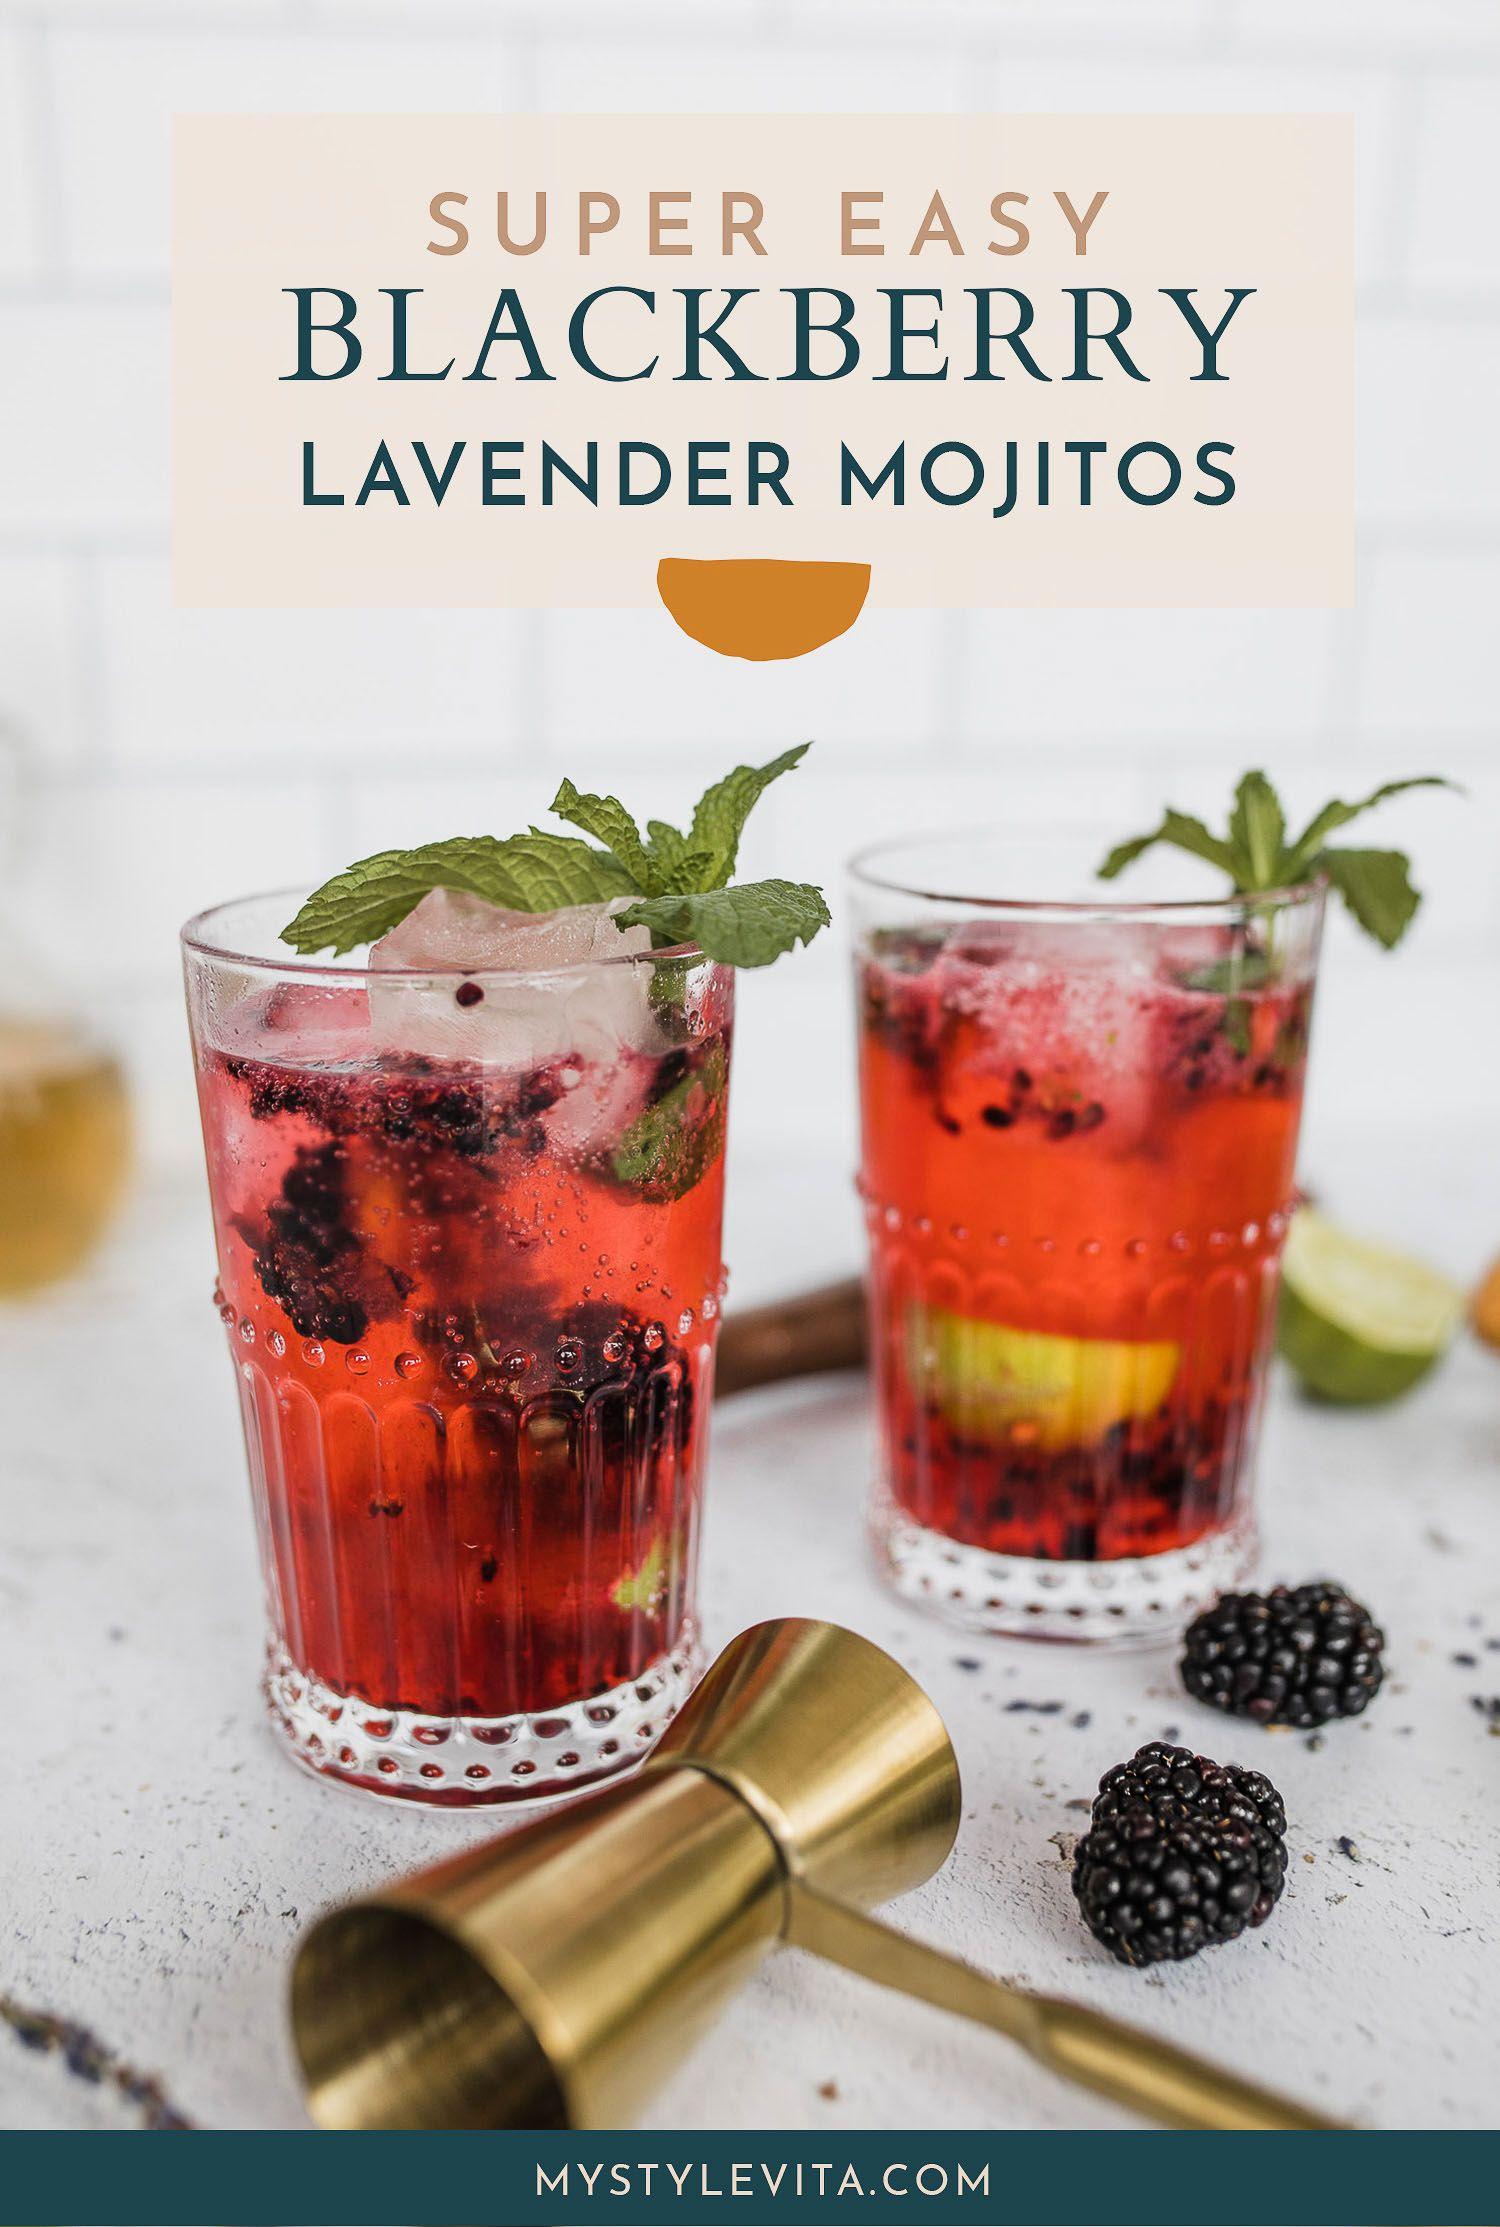 Blackberry Lavender Mojitos Lavender Syrup Fun Easy Recipes Summer Cocktail Recipes